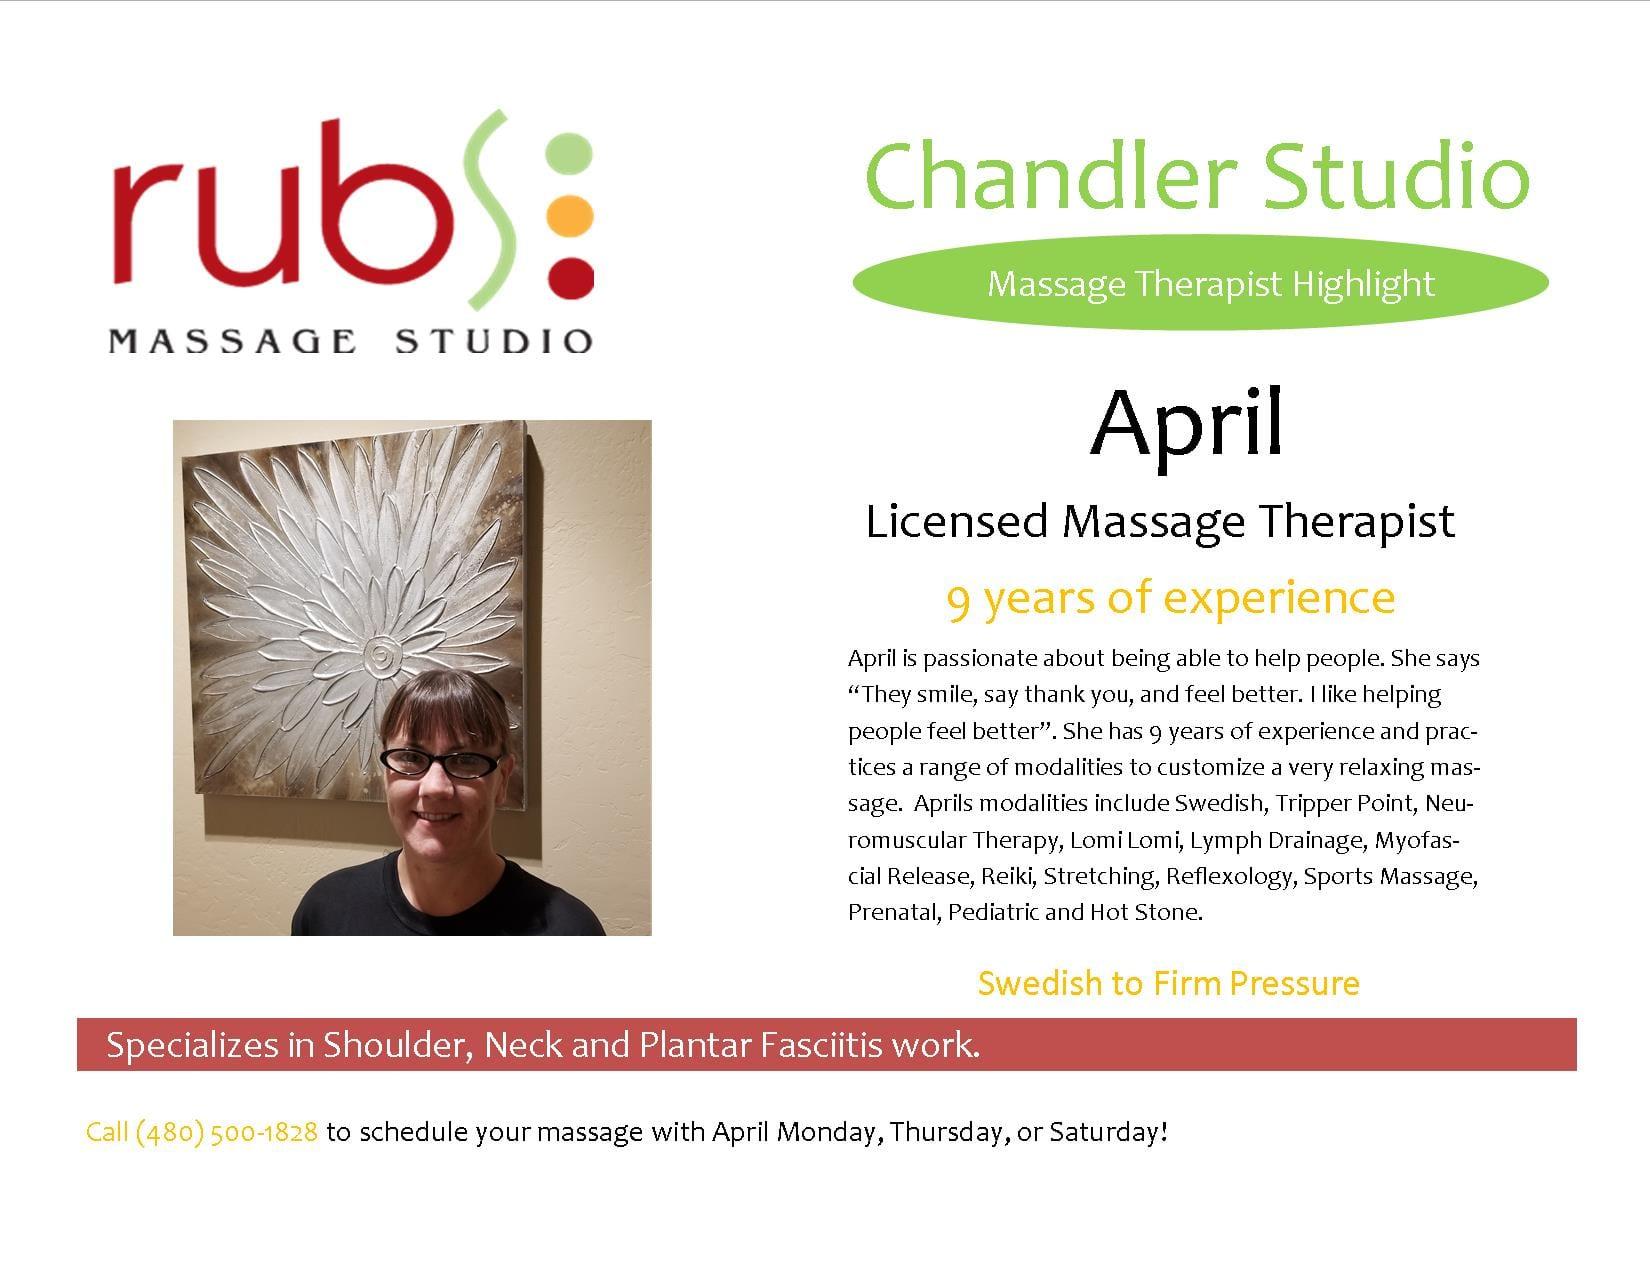 massage chandler therapist - April